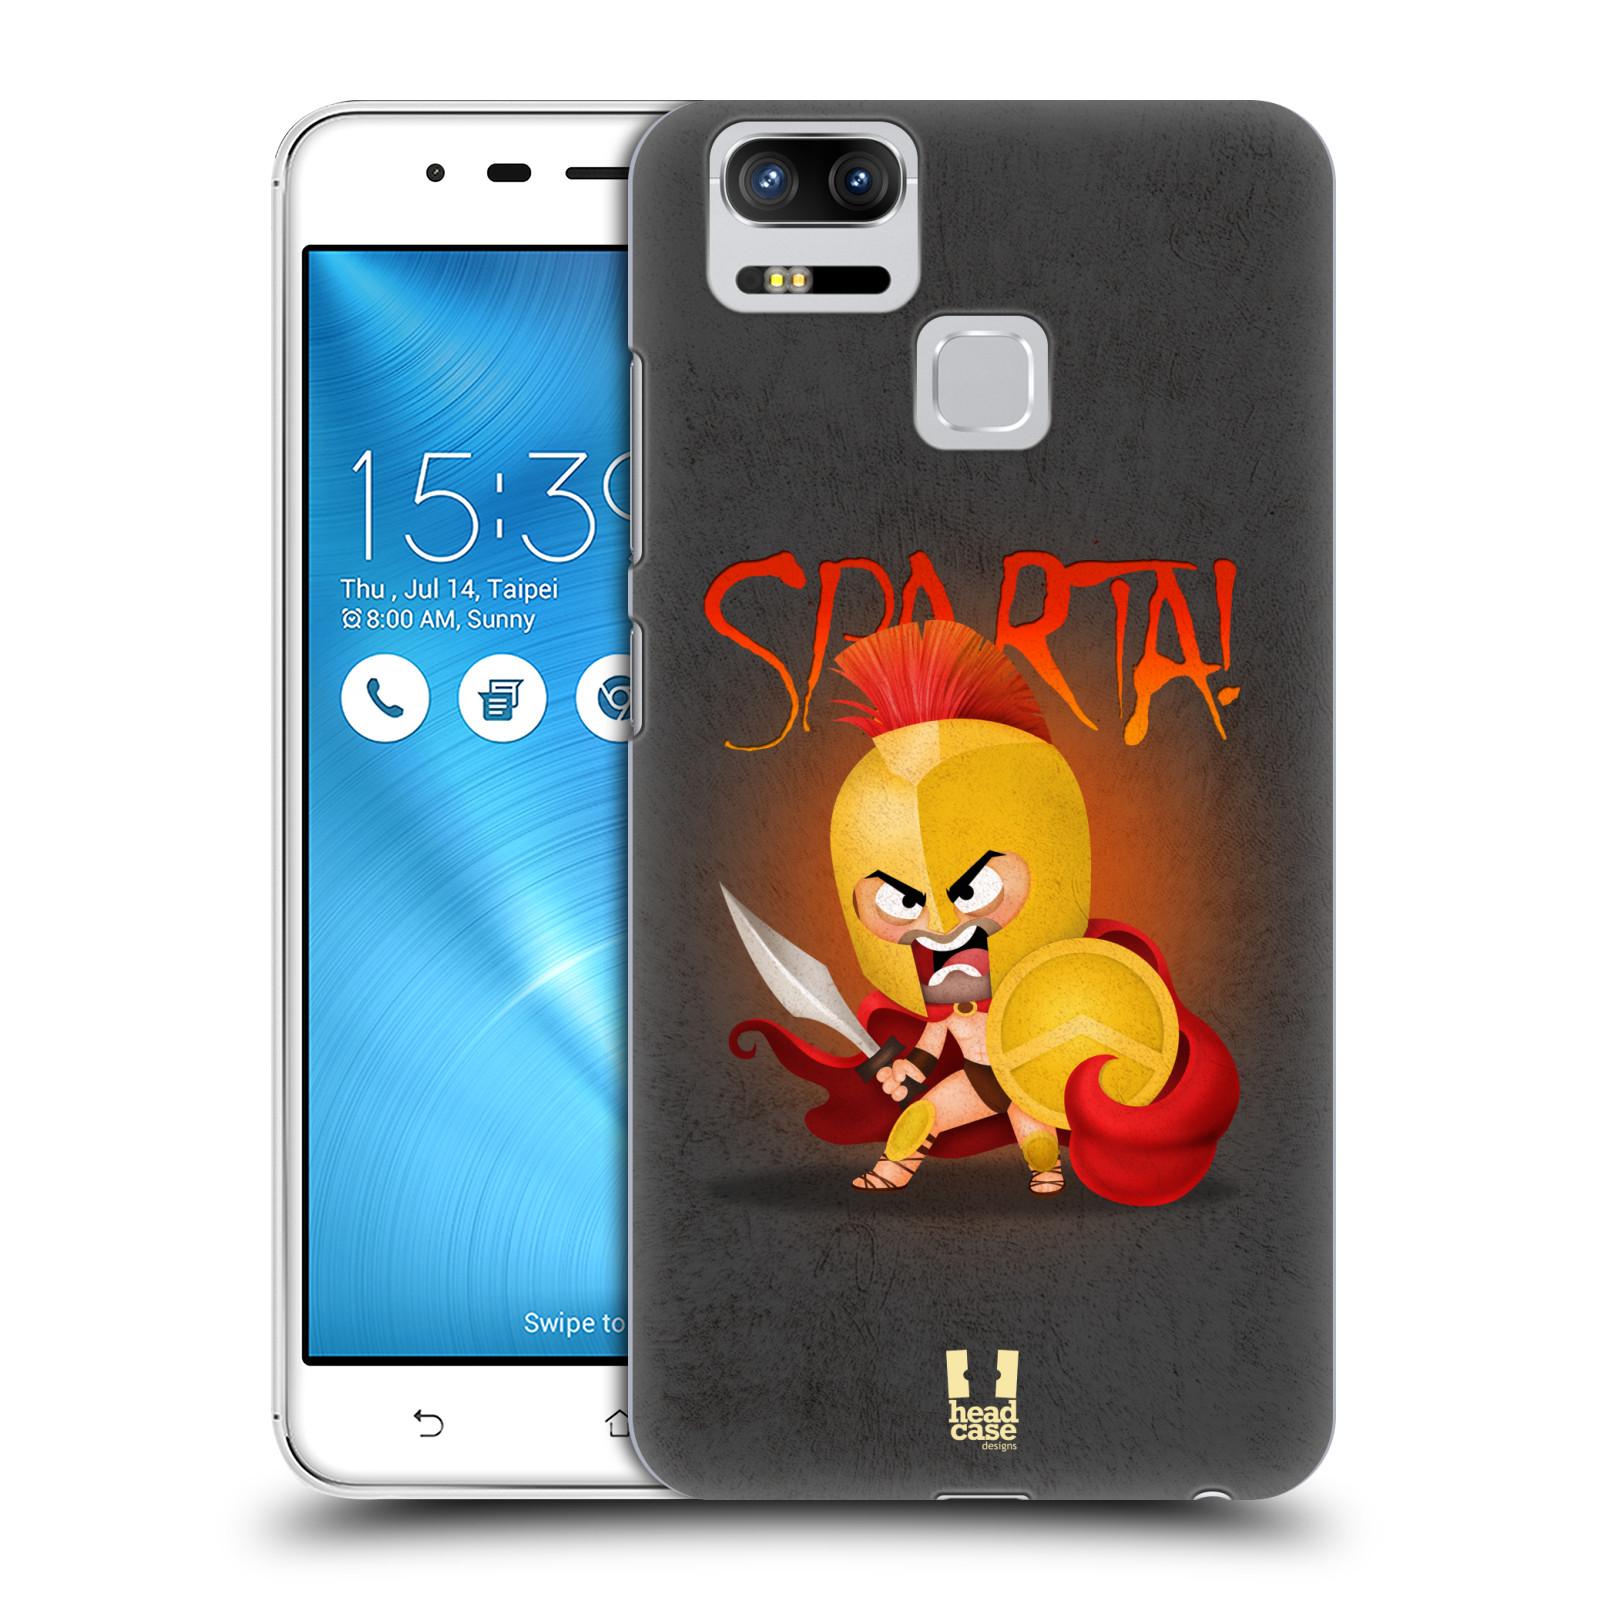 Plastové pouzdro na mobil Asus ZenFone 3 ZOOM ZE553KL - Head Case - Sparta (Plastový kryt či obal na mobilní telefon Asus ZenFone 3 ZOOM ZE553KL s motivem Sparta)